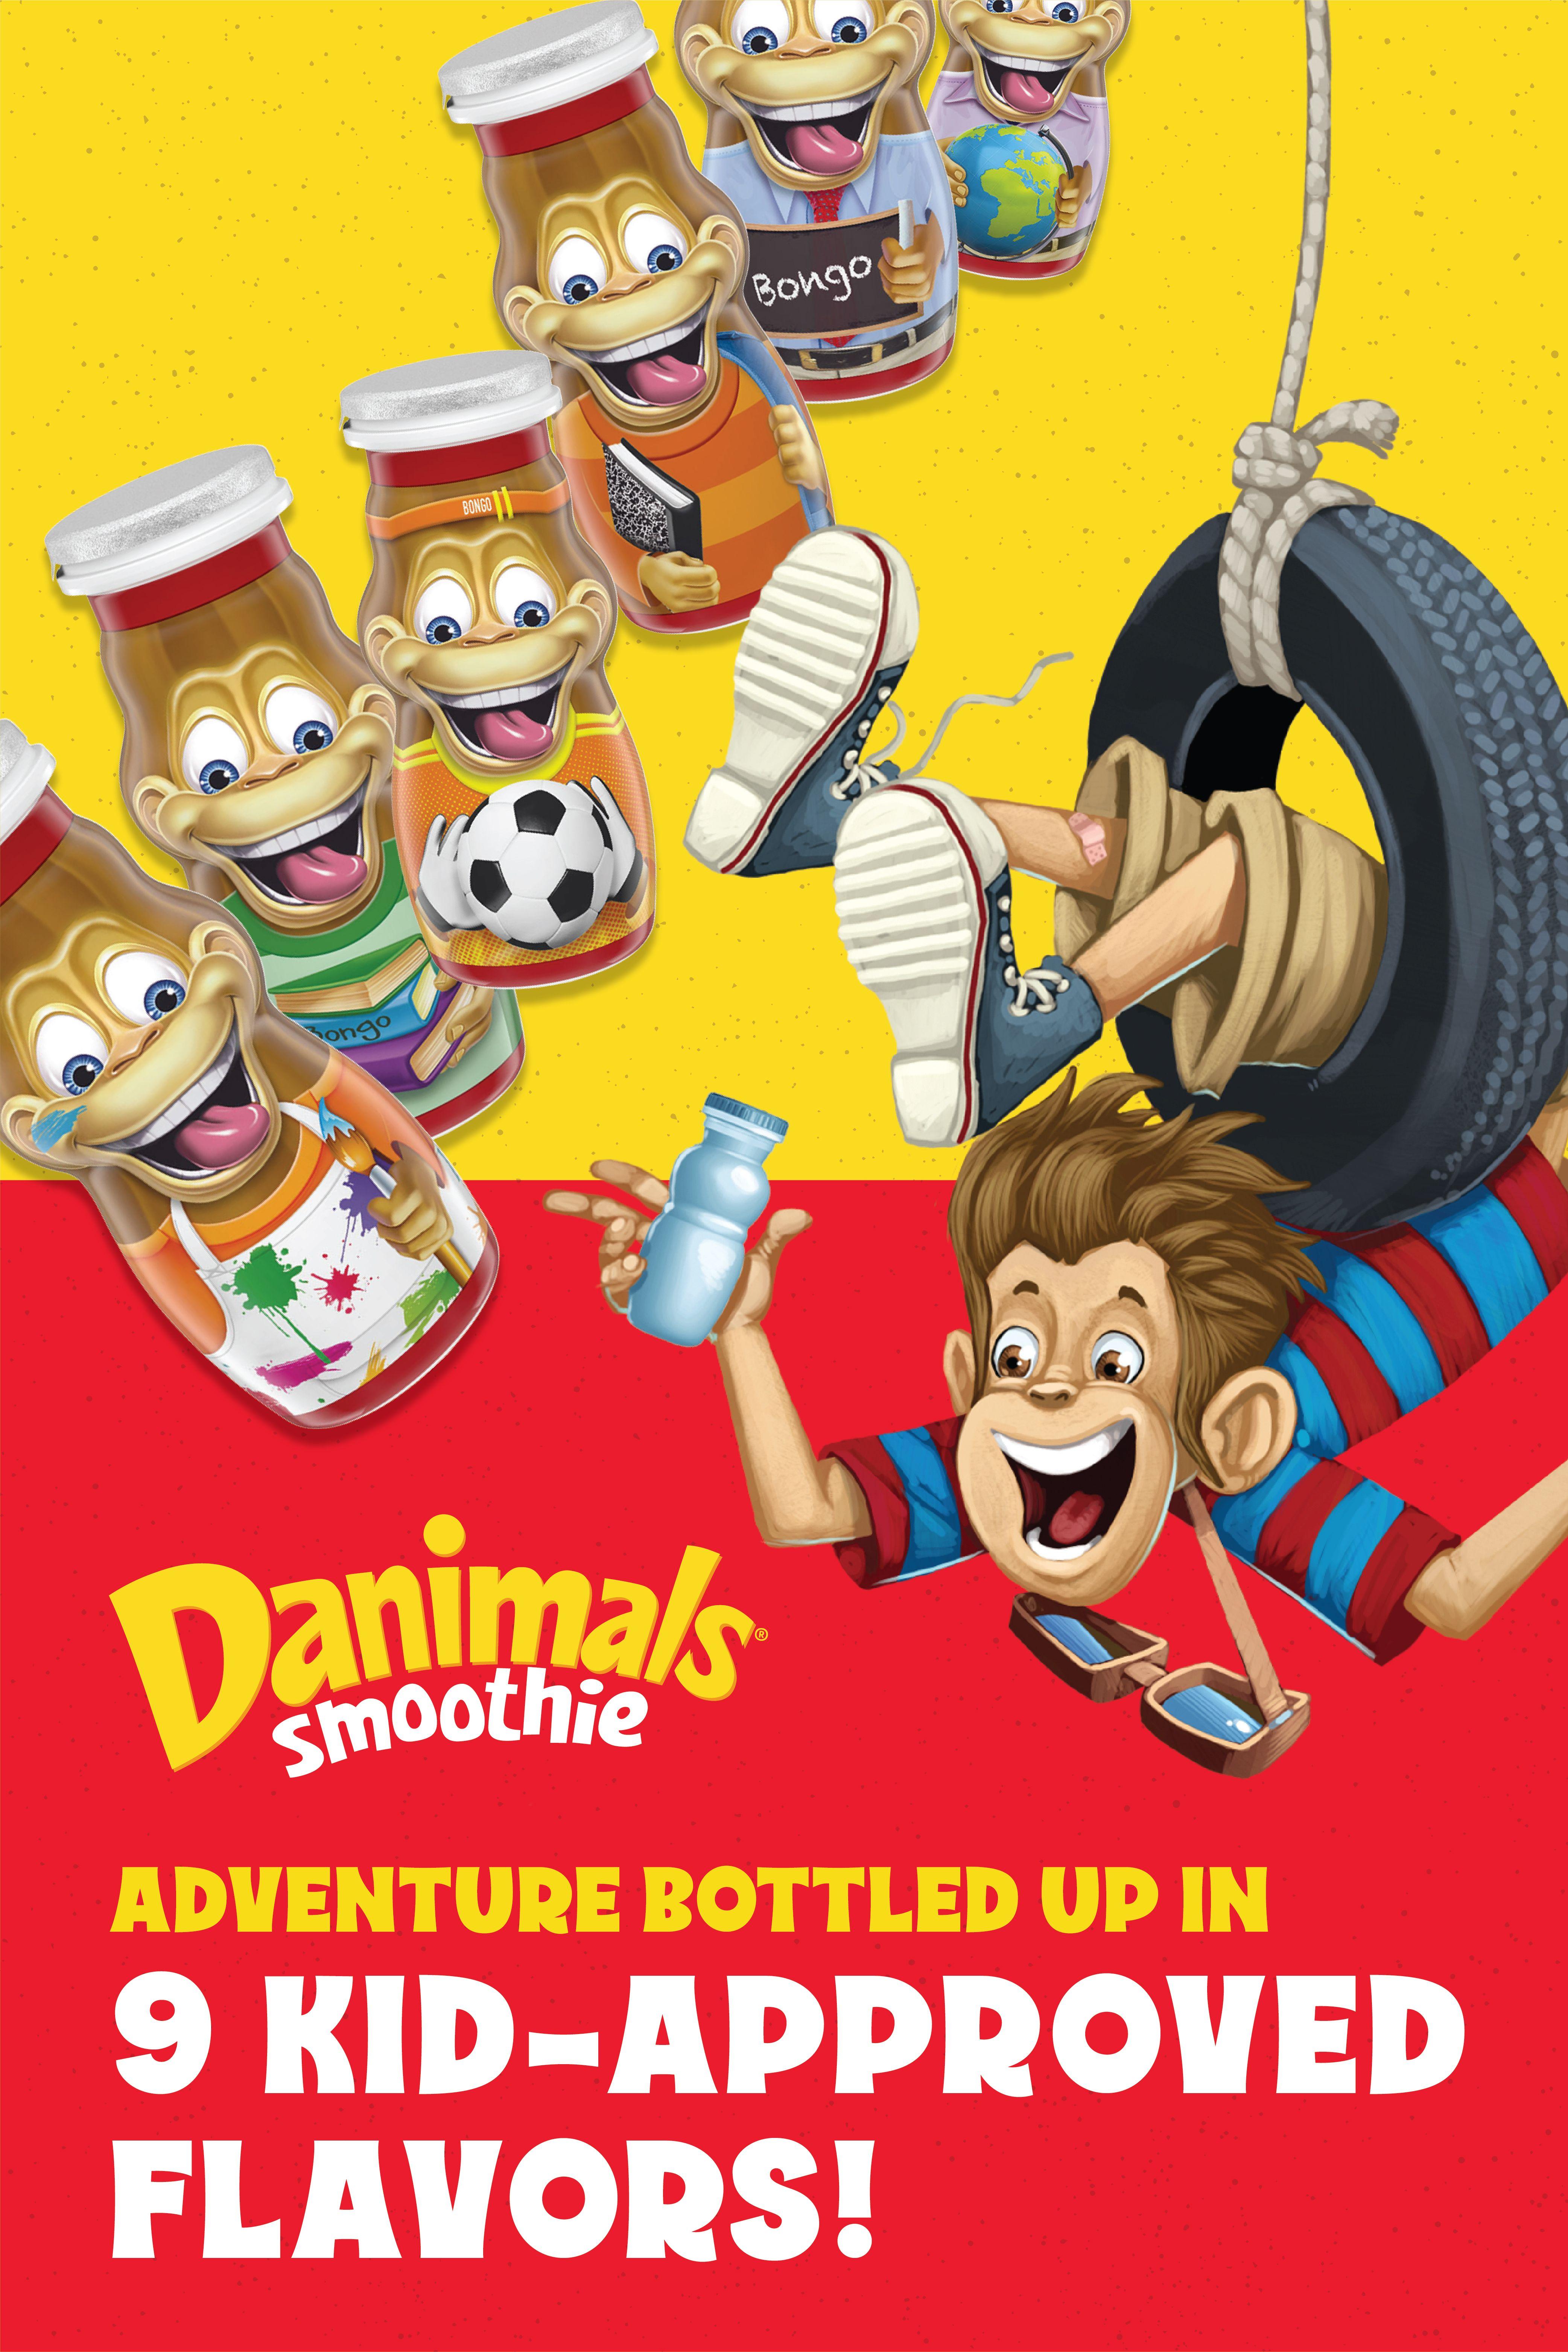 Adventure Bottled Up In 9 Kid Approved Flavors In 2020 Funny Instagram Memes Art Drawings For Kids Kids Yogurt